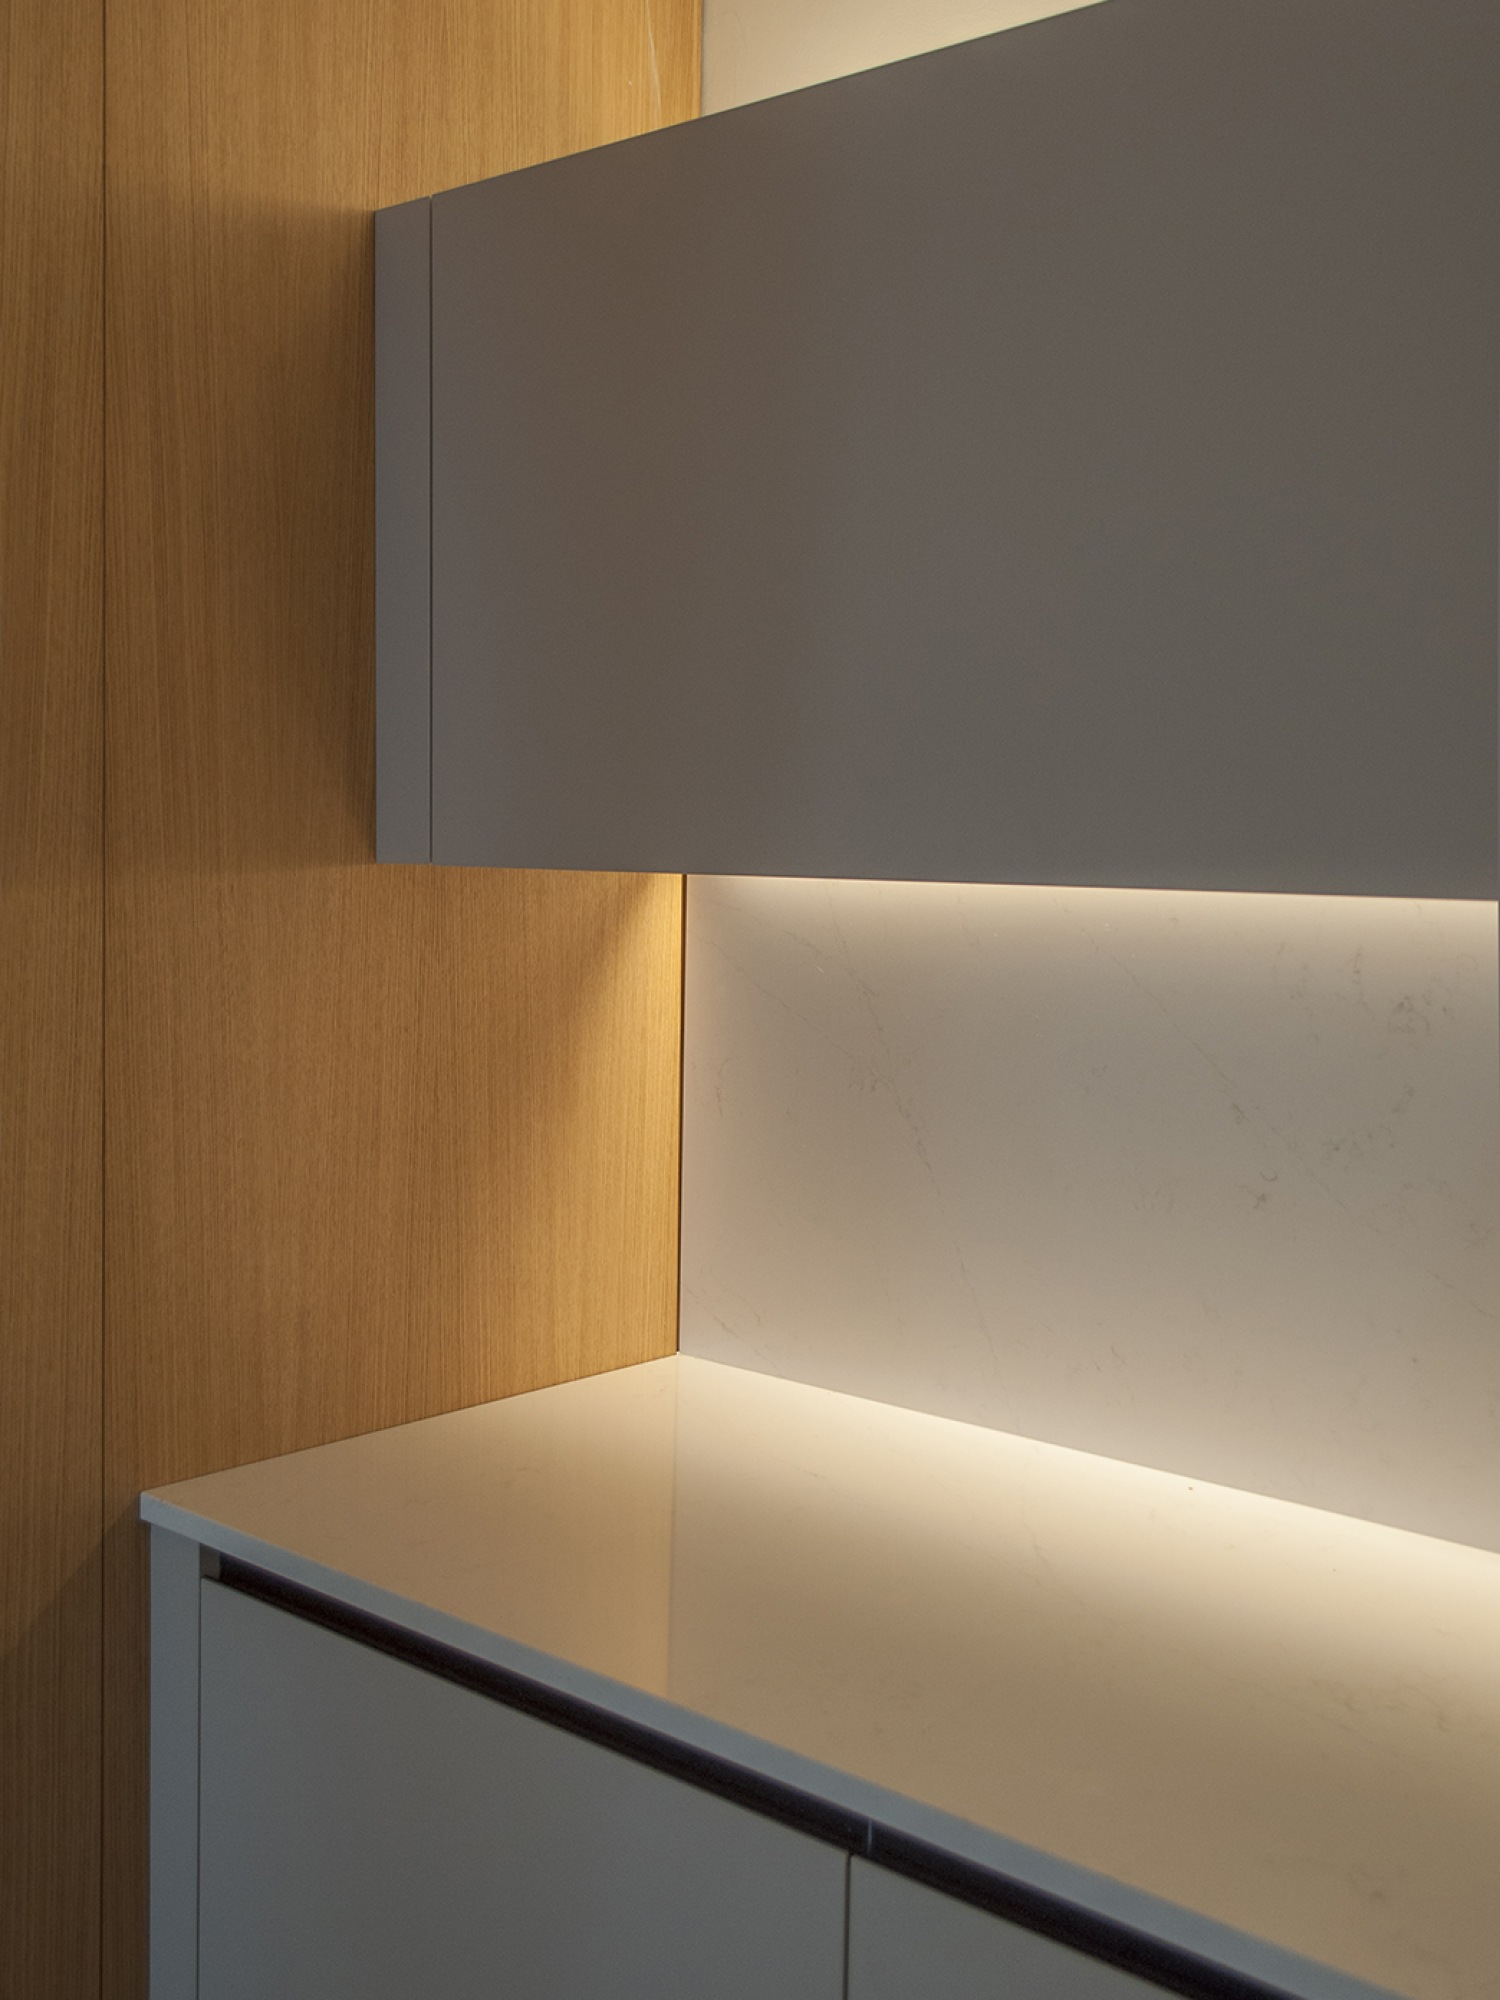 14-architecture-sitges-interior-design-barcelona-kitchen-modern-led-silestone-wood